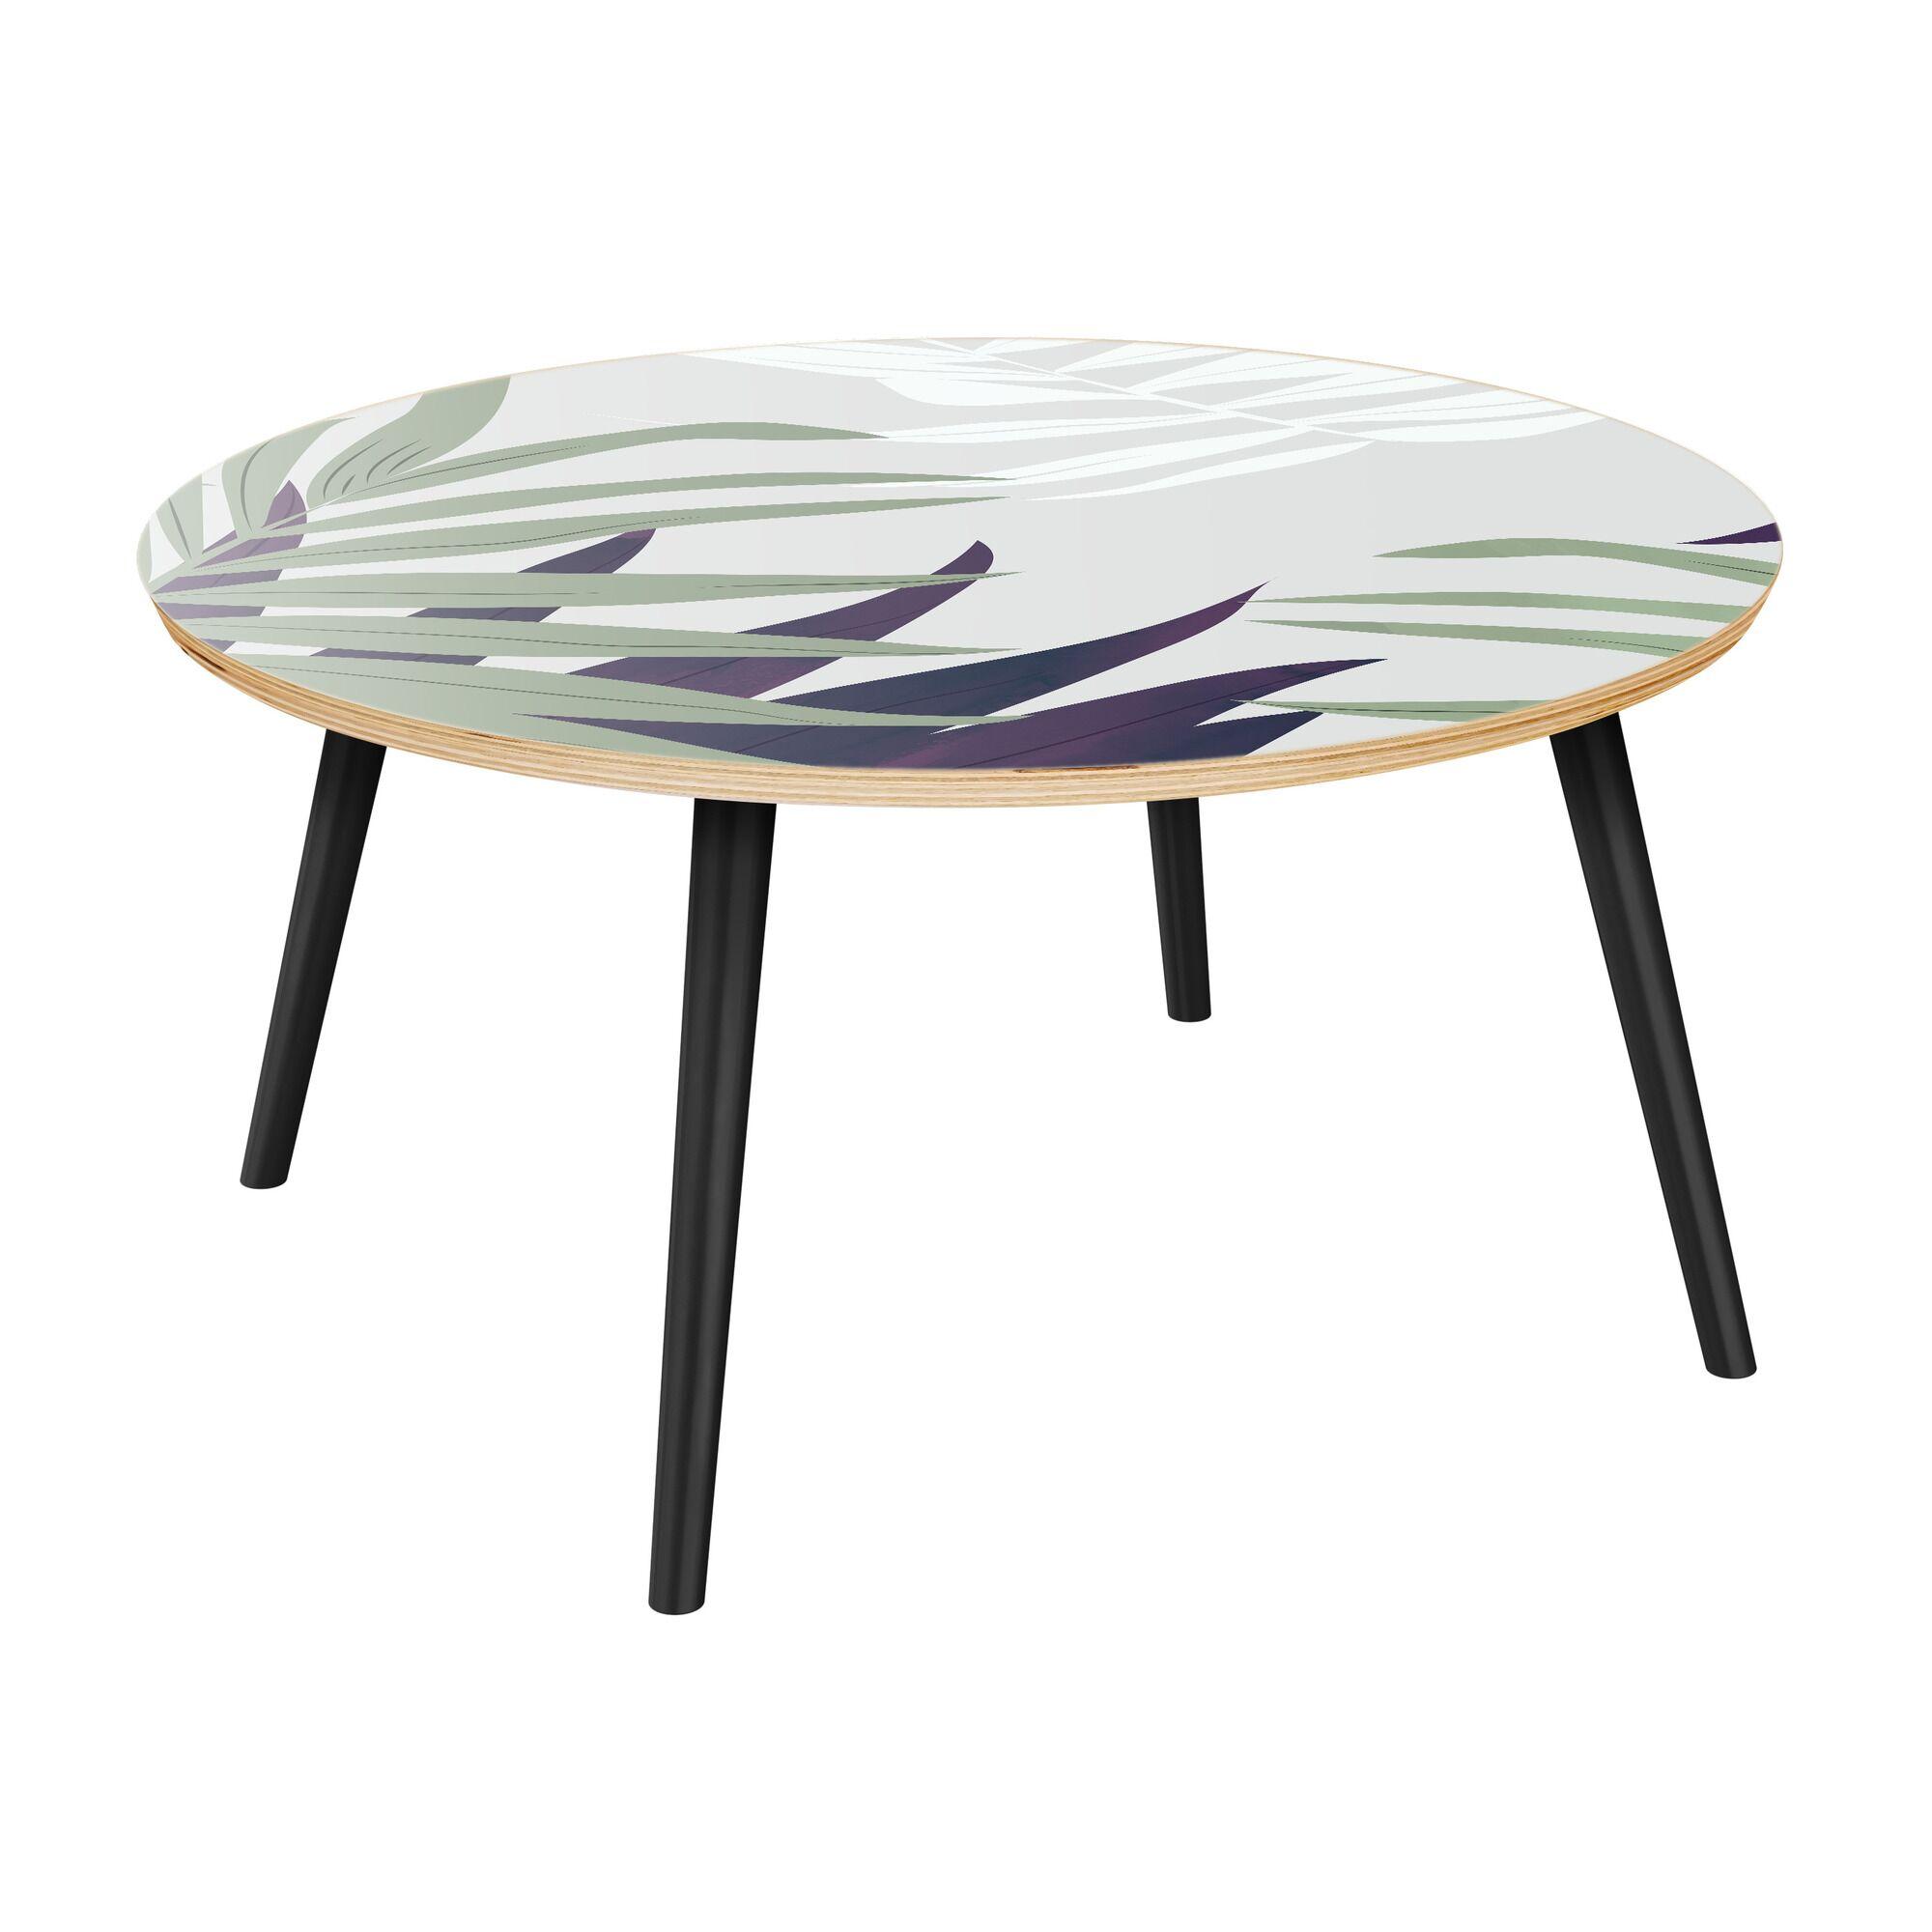 Schermerhorn Coffee Table Table Top Color: Natural, Table Base Color: Black